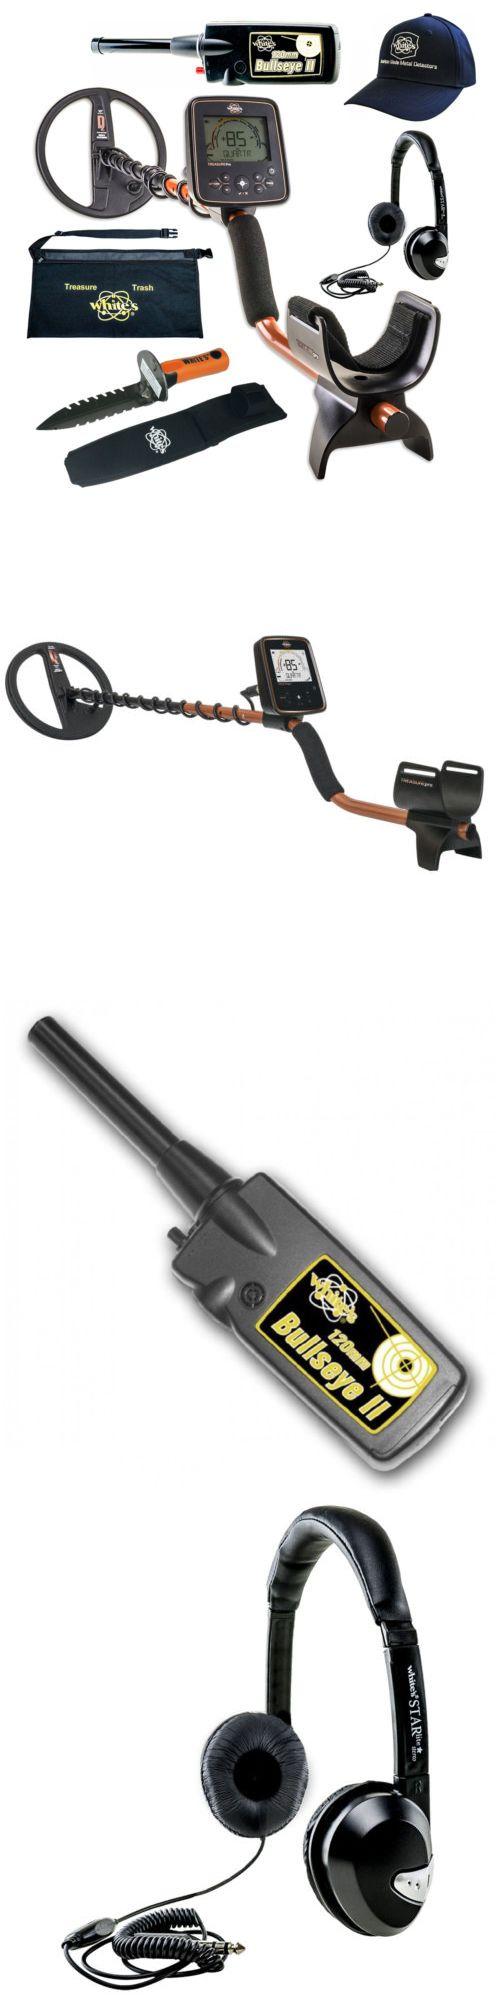 Metal Detectors: Whites Treasurepro Metal Detector Geared Up Bundle BUY IT NOW ONLY: $399.95